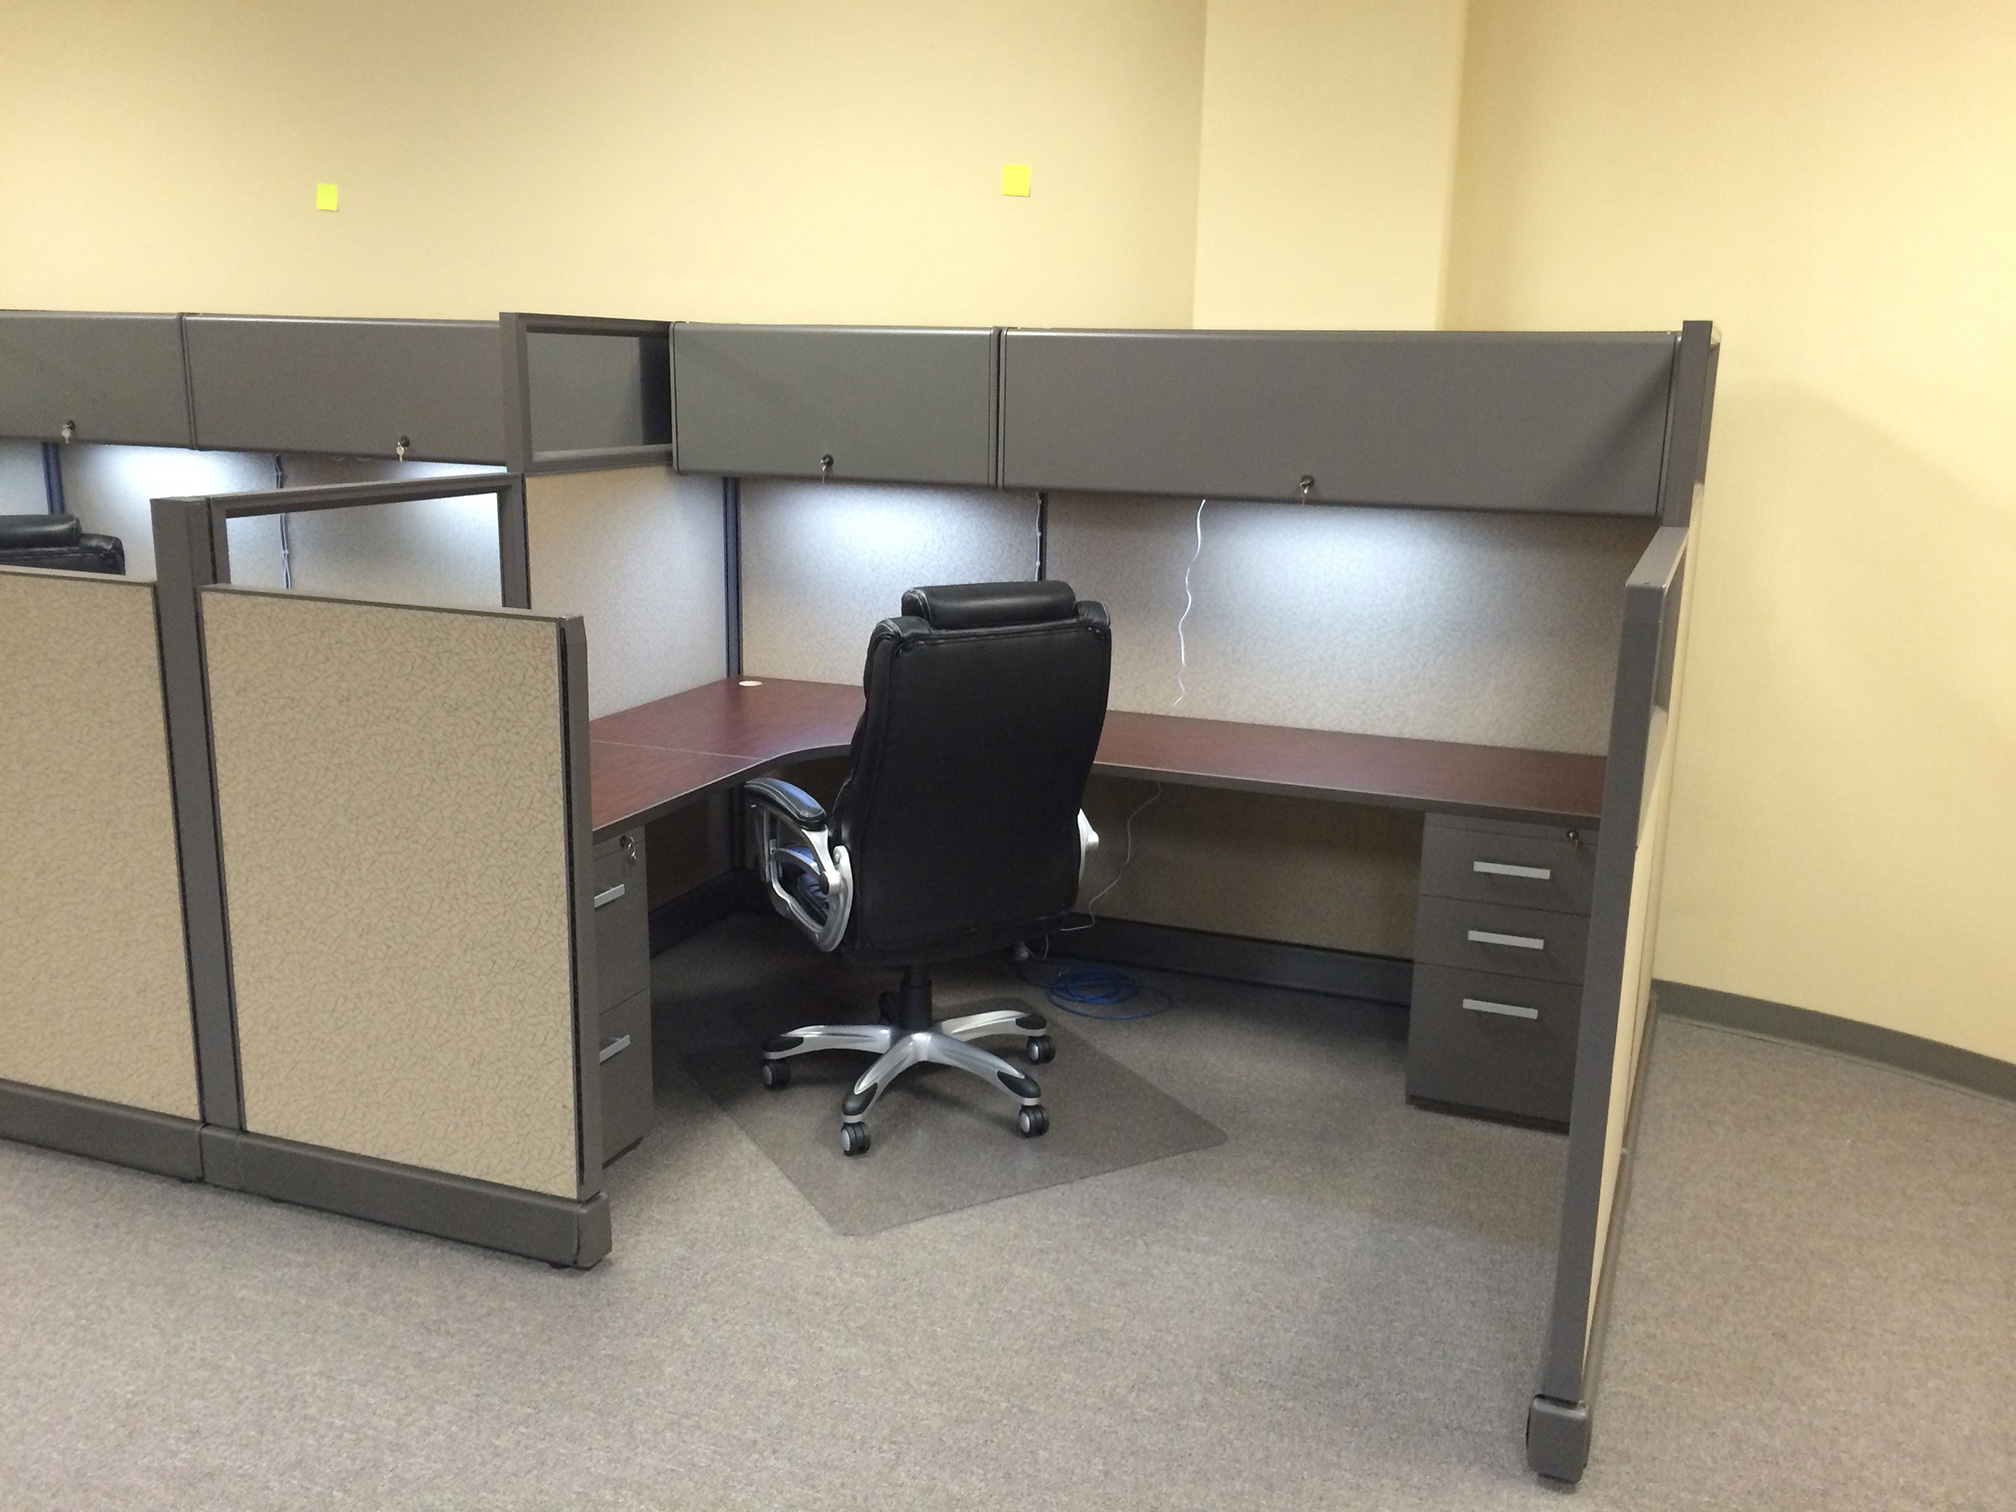 office-cubicles-for-sale-in-bonita-spring-florida-3-2.jpg